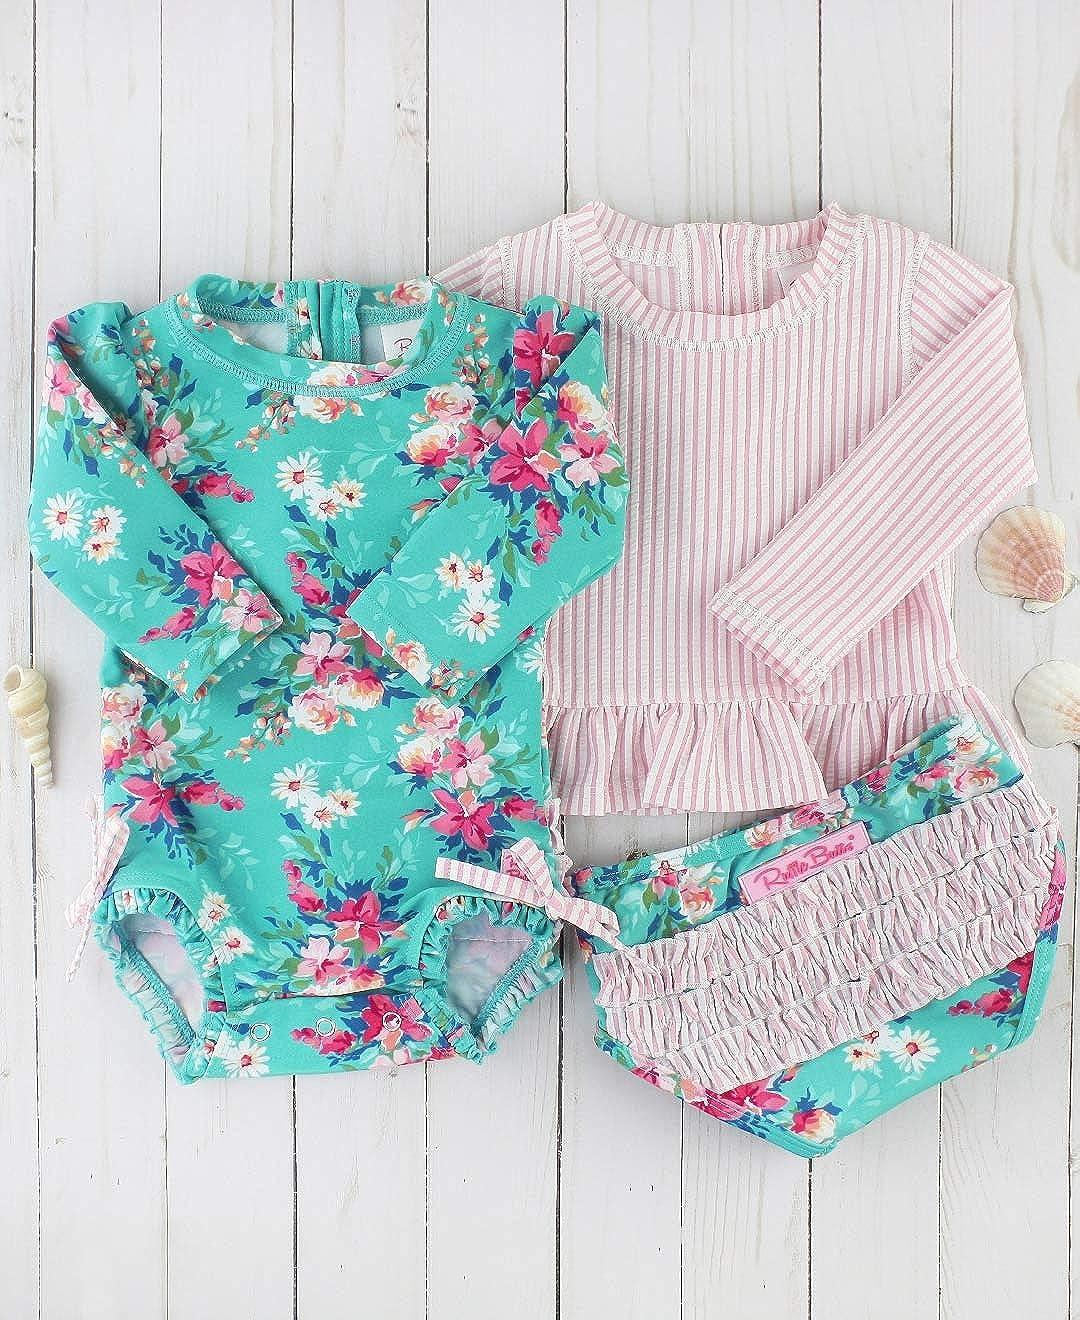 RuffleButts Baby//Toddler Girls Rash Guard 2-Piece Swimsuit Set Long Sleeve Bikini with UPF 50 Sun Protection RGSYYXX-PRLS-SC-BABY